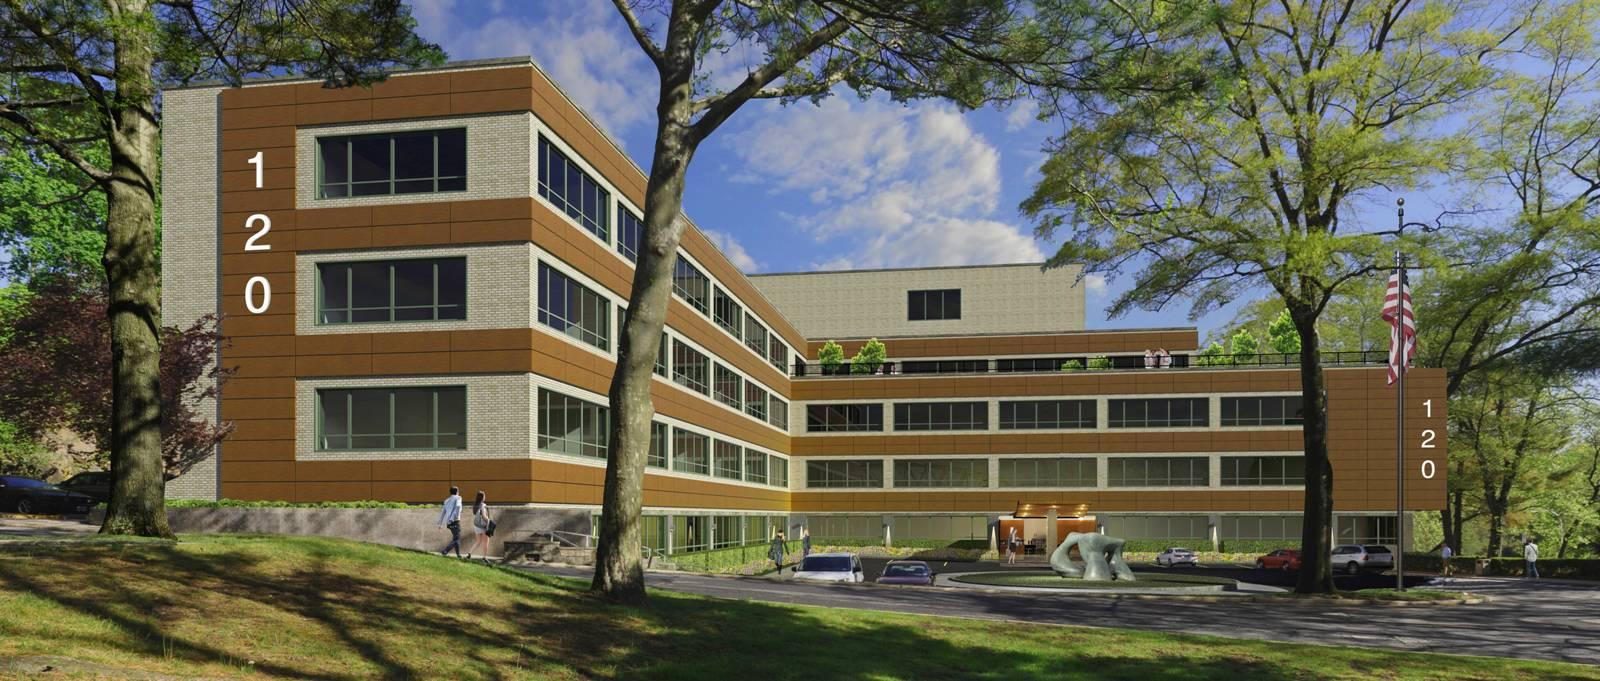 1306_Building-Render